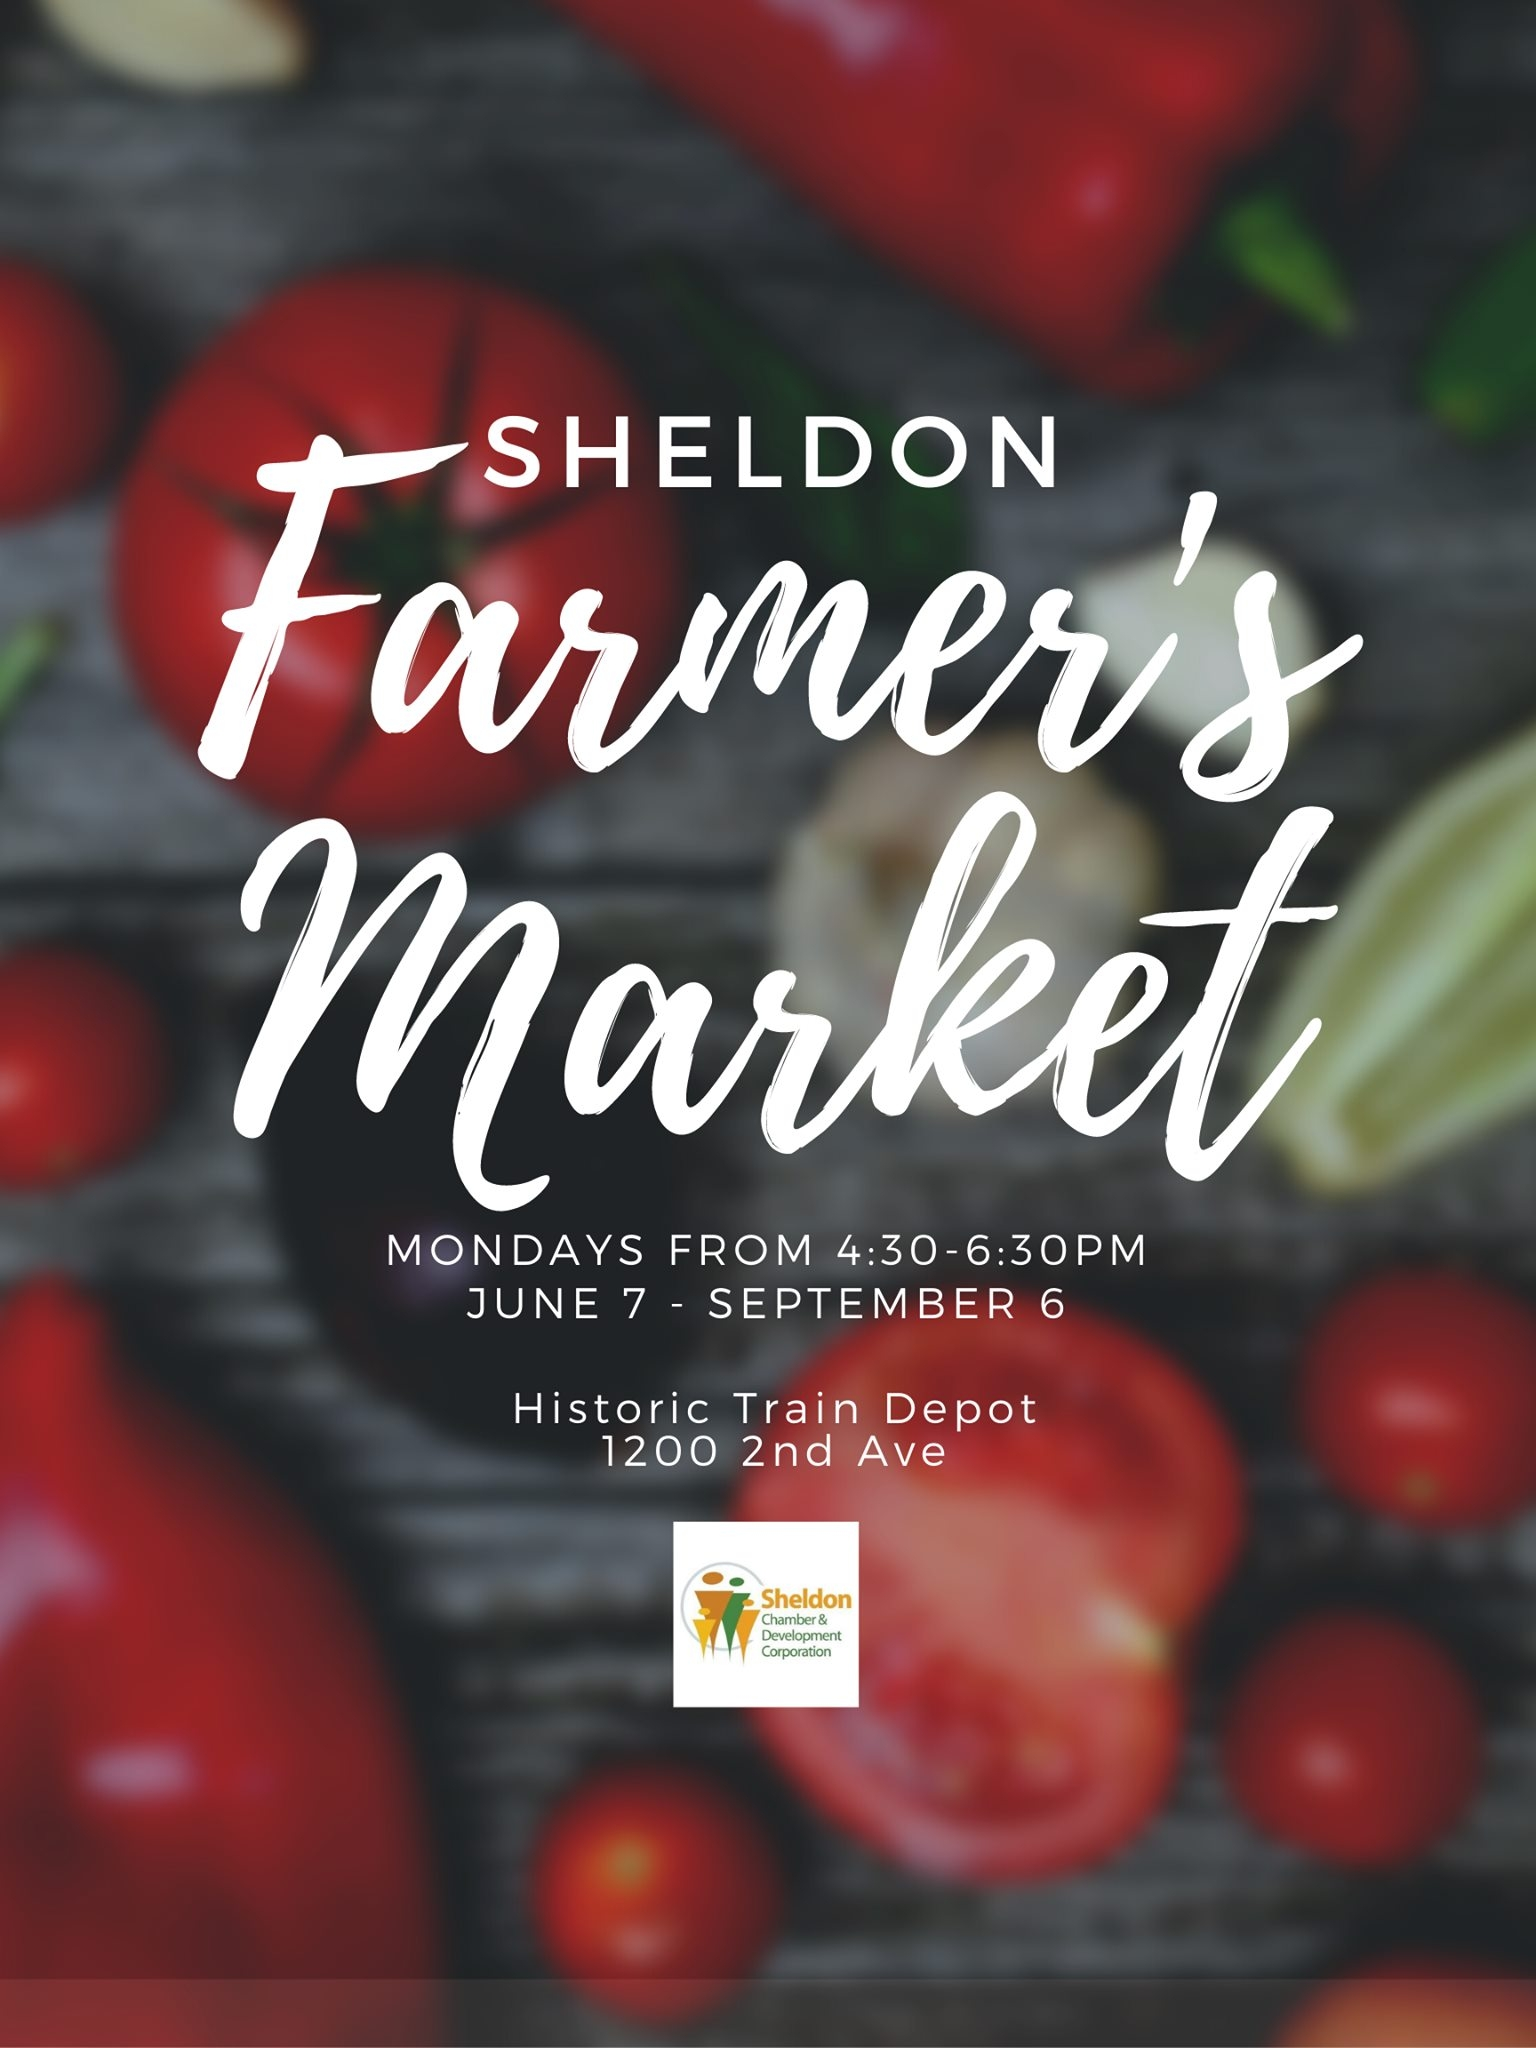 Sheldon Farmer's Market